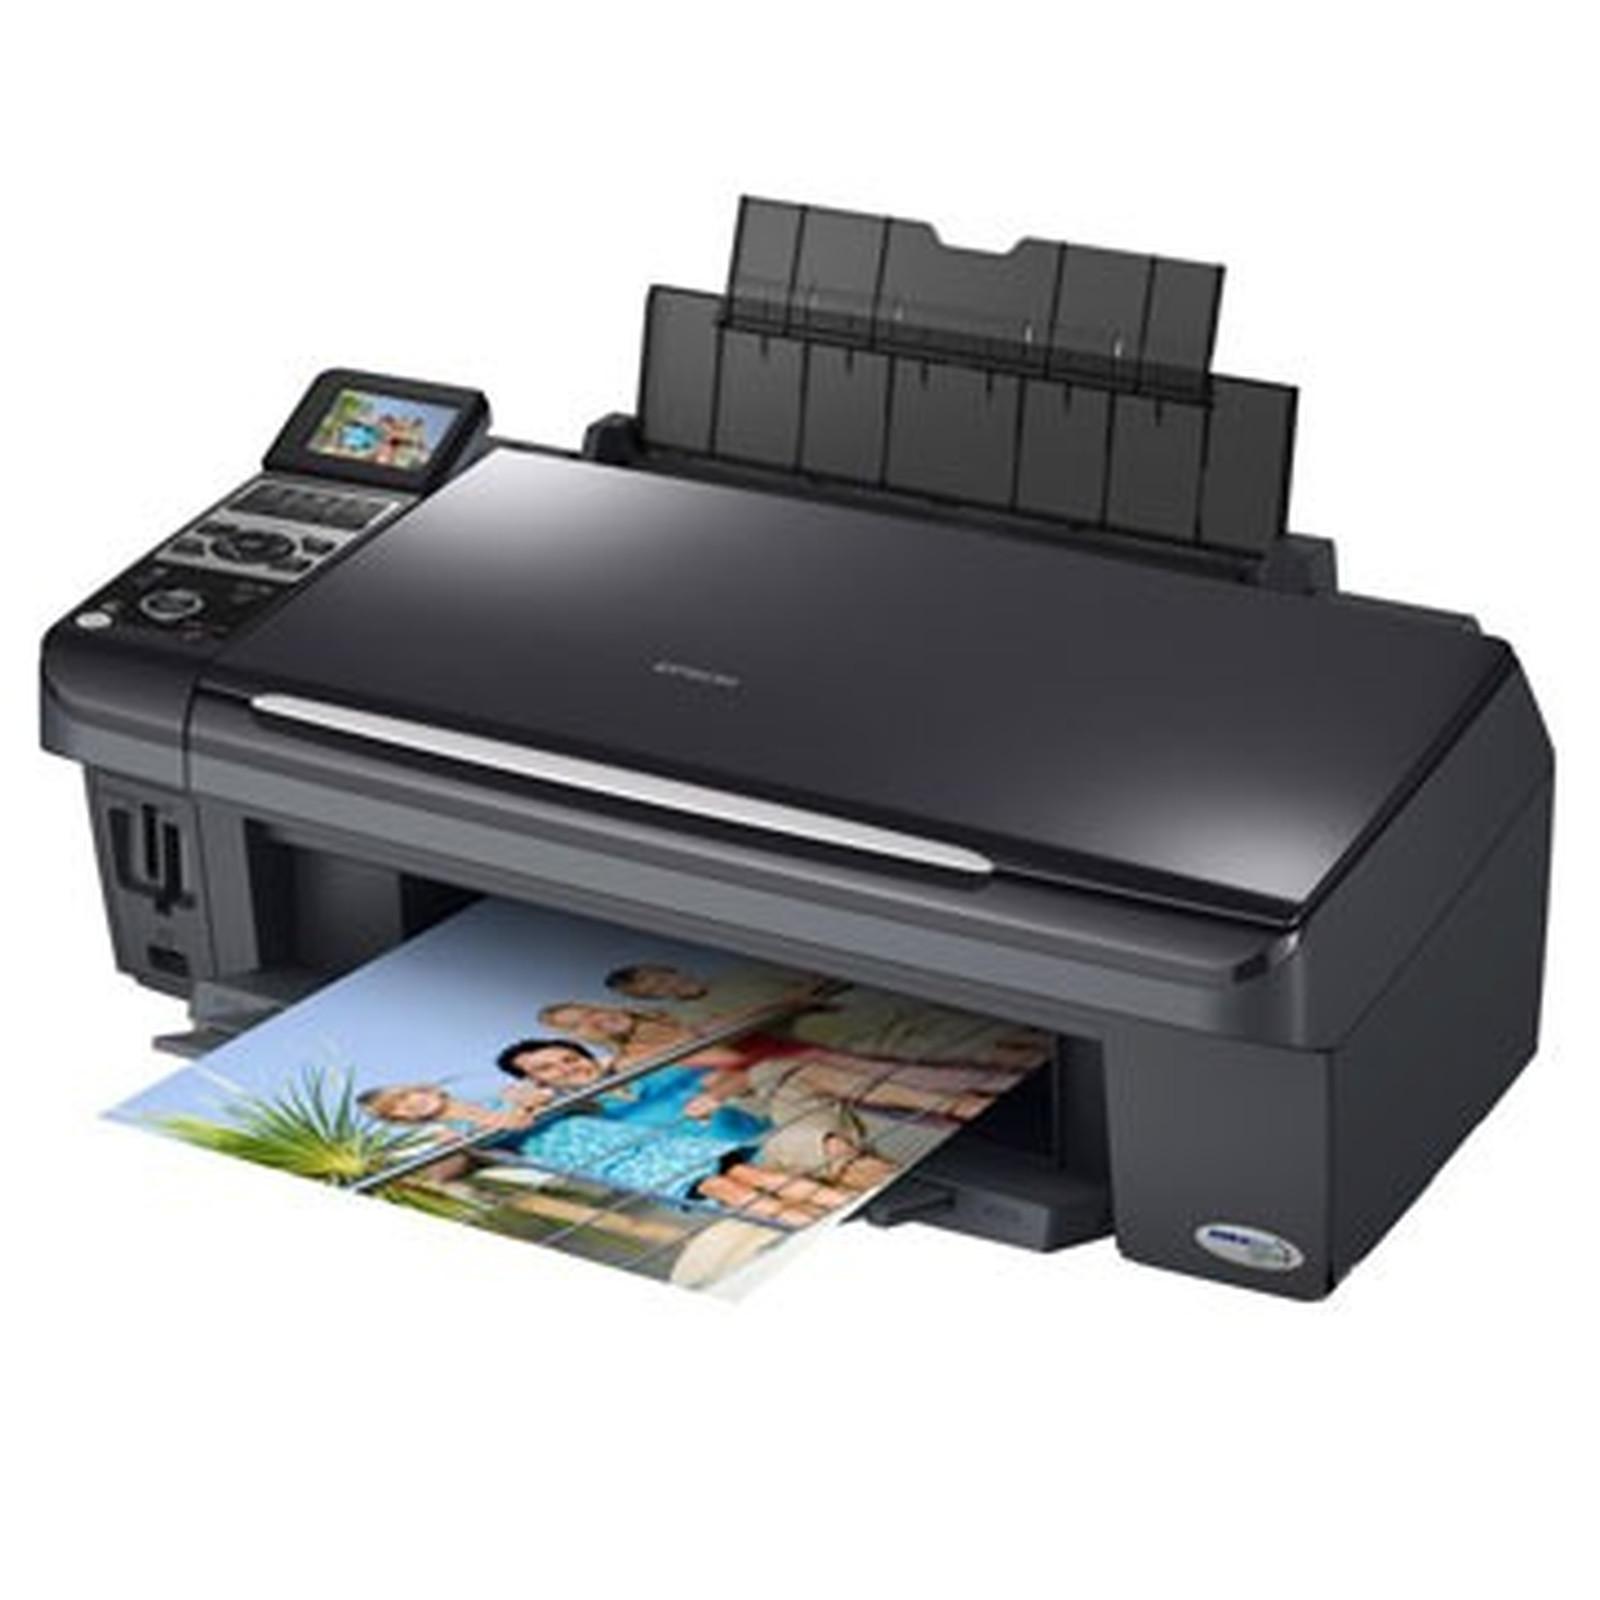 pilote imprimante epson stylus dx8450